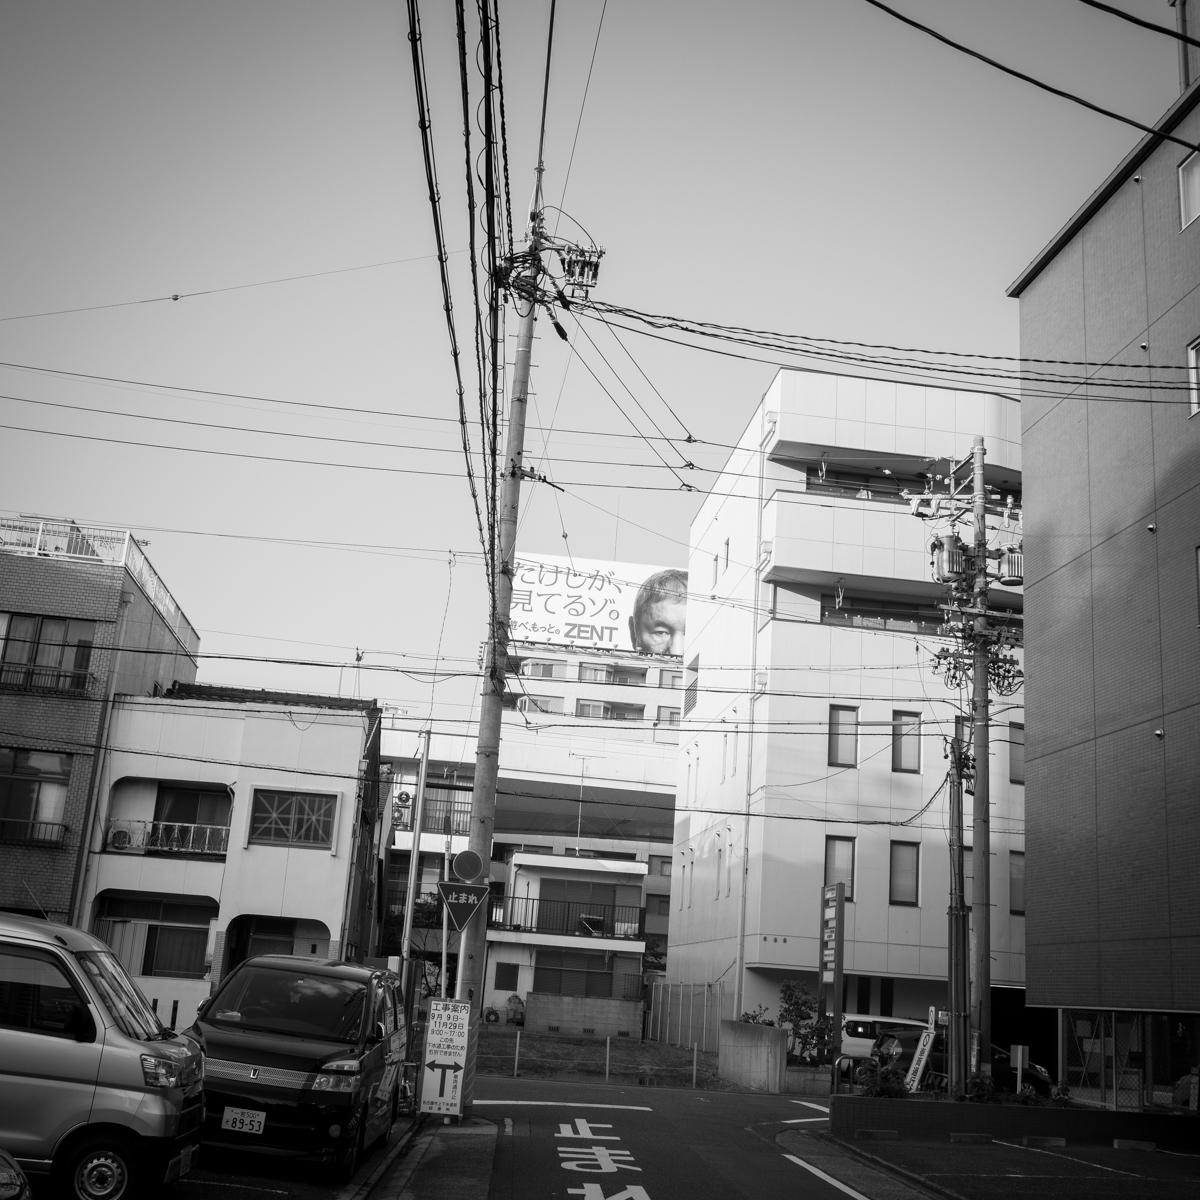 f:id:nagoya-meshi:20191107234921j:plain